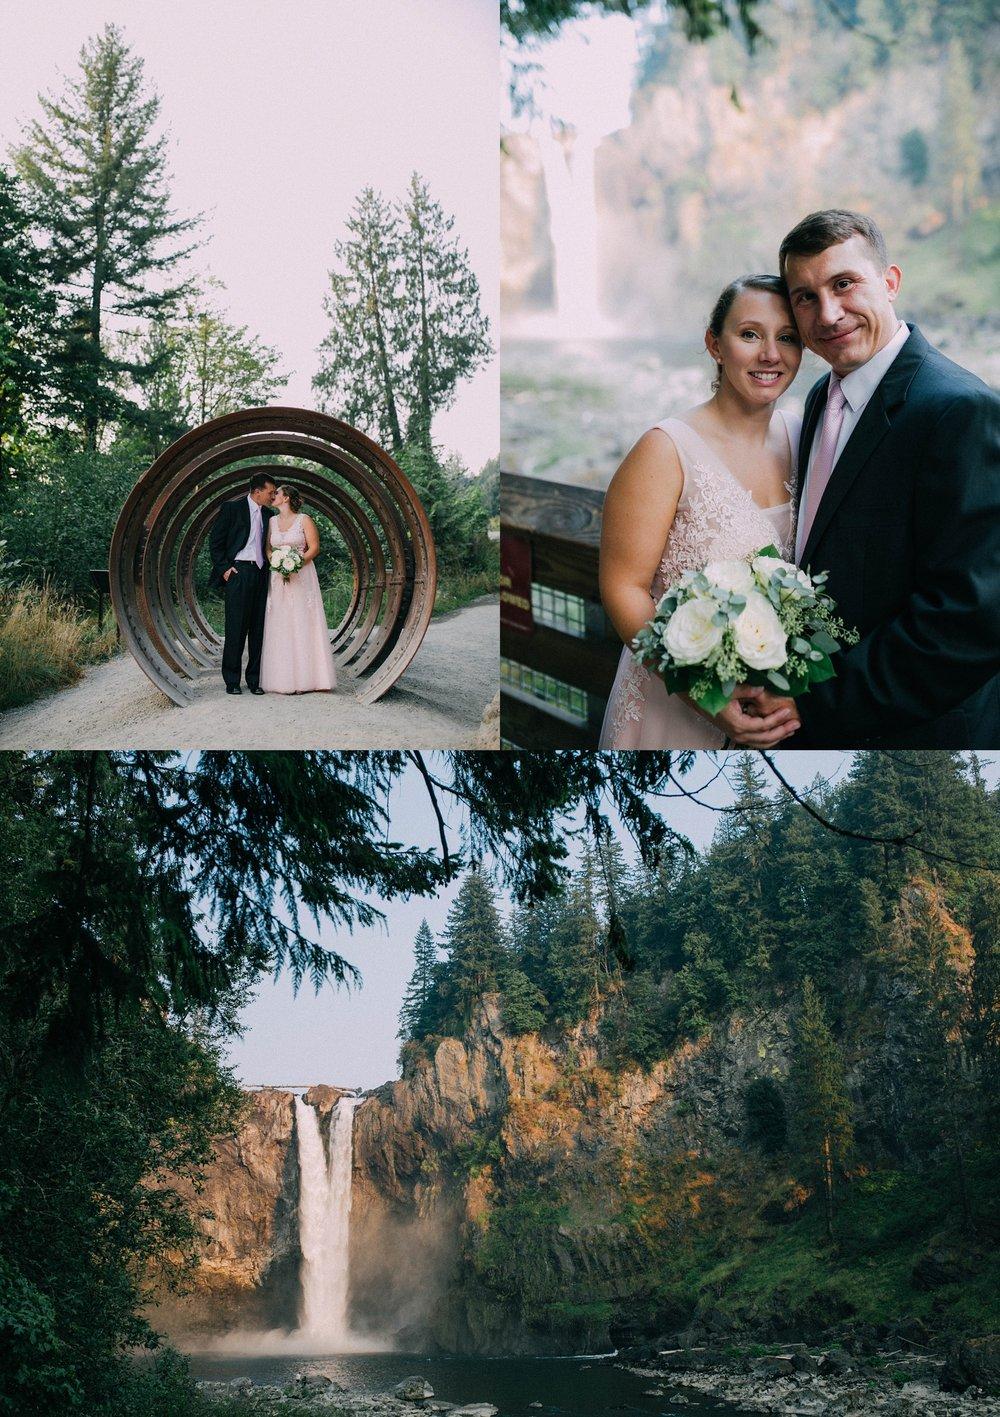 ashley_vos_seattle_ wedding_photographer_0489.jpg